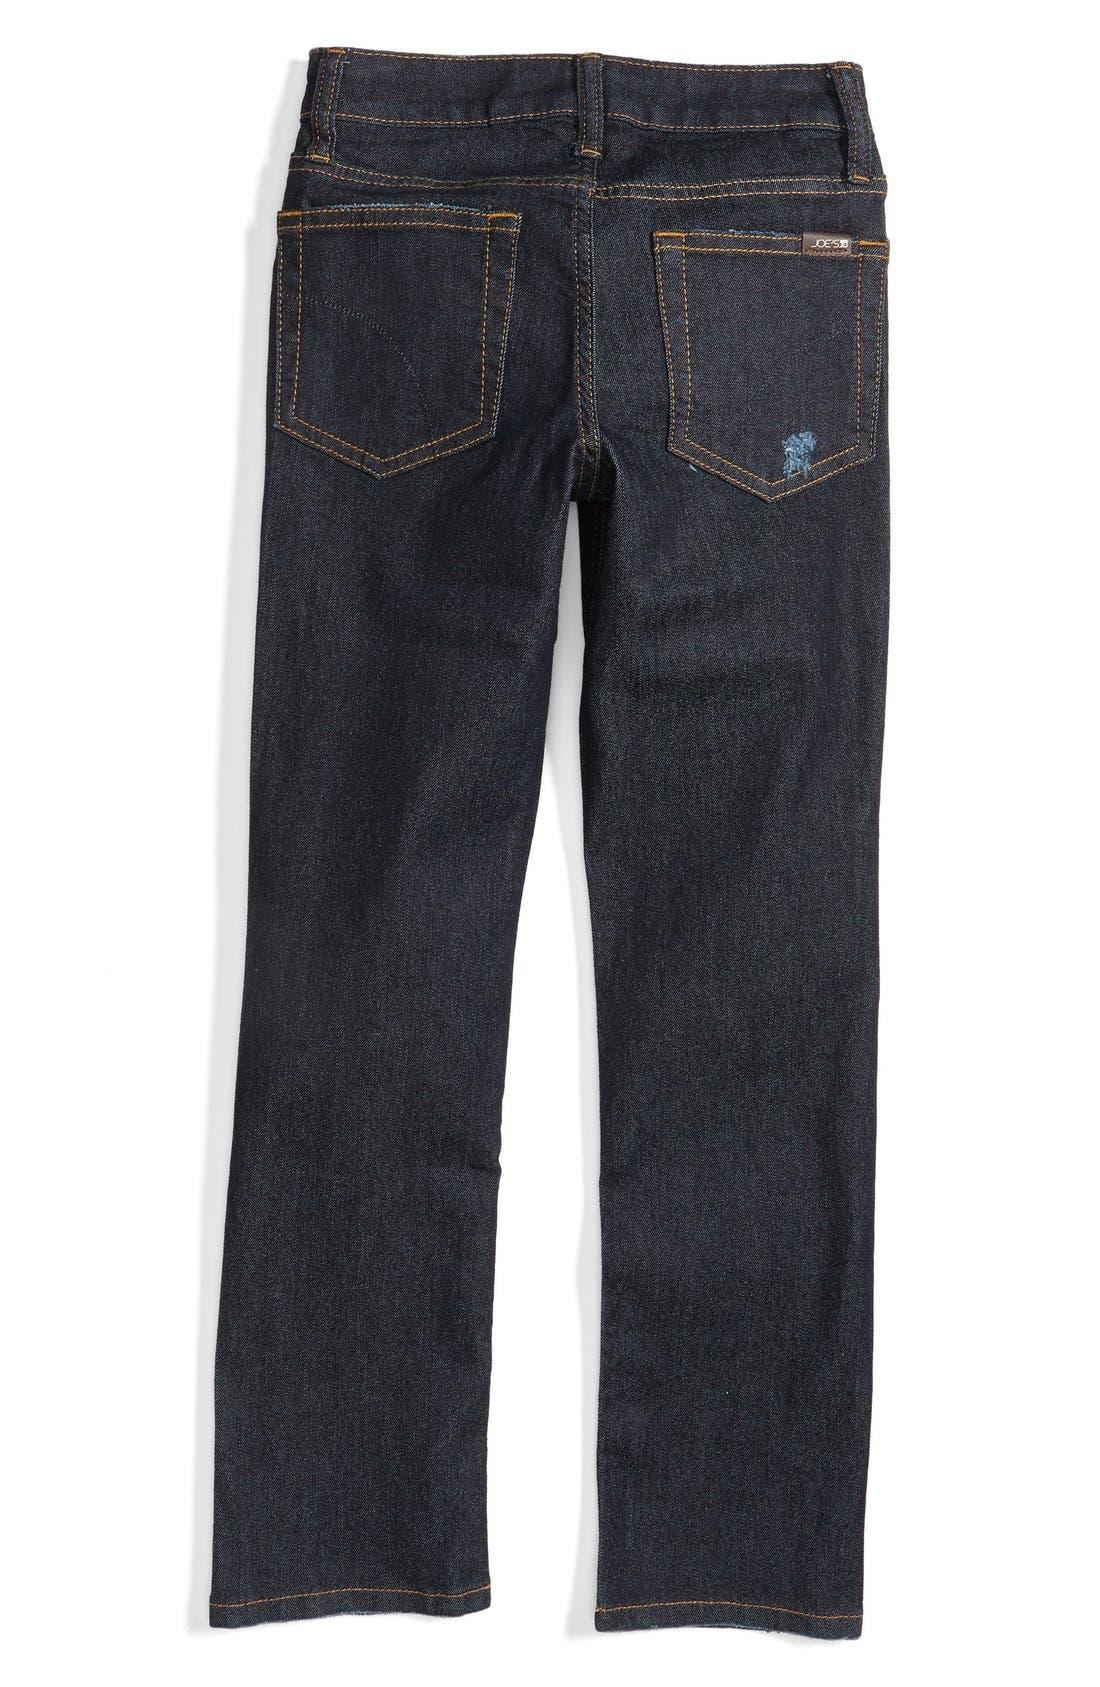 Brixton Straight Leg Jeans,                             Alternate thumbnail 4, color,                             400